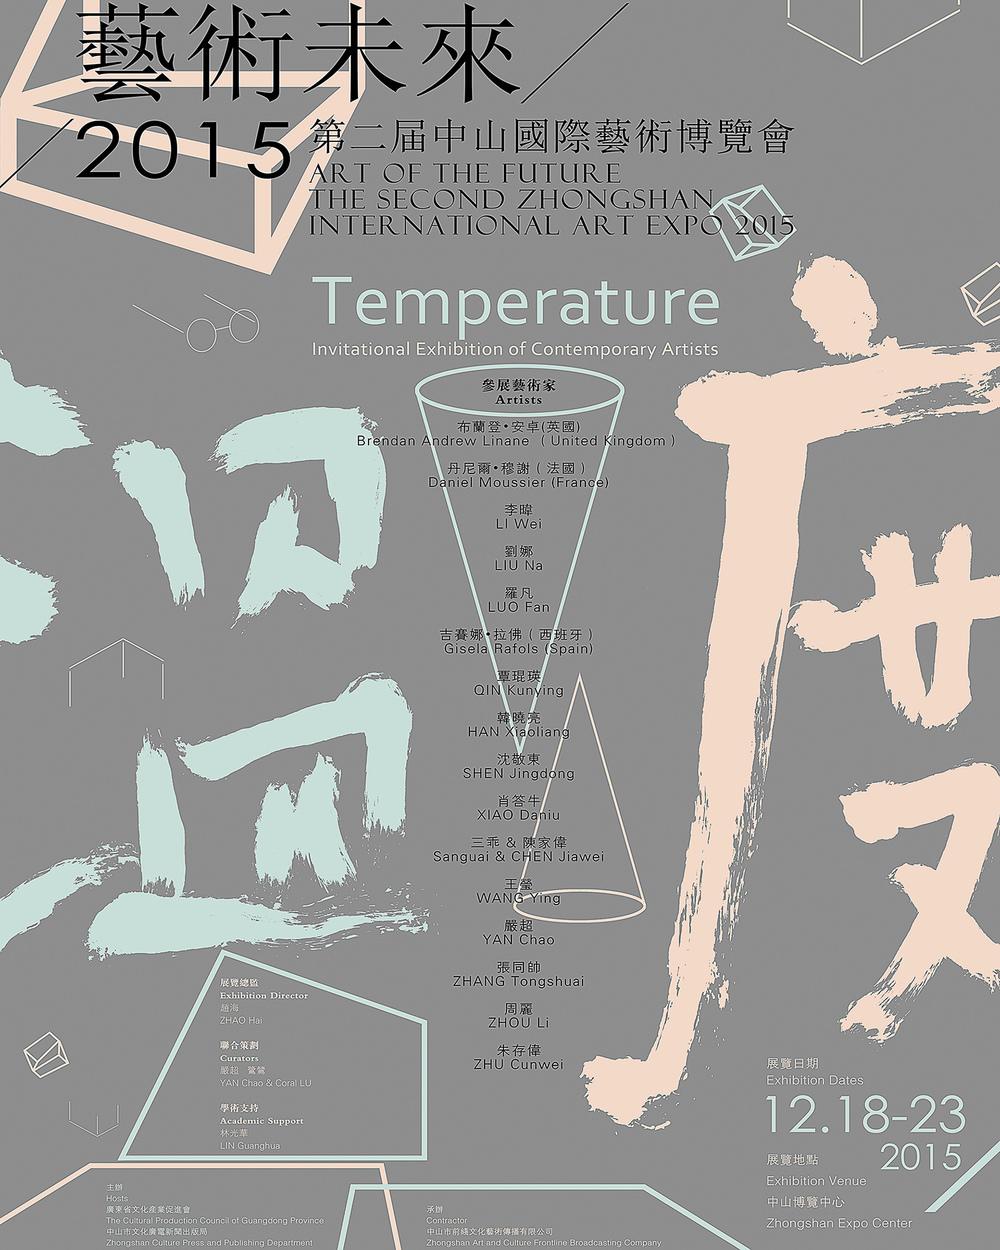 Poster10X8 copy.jpg